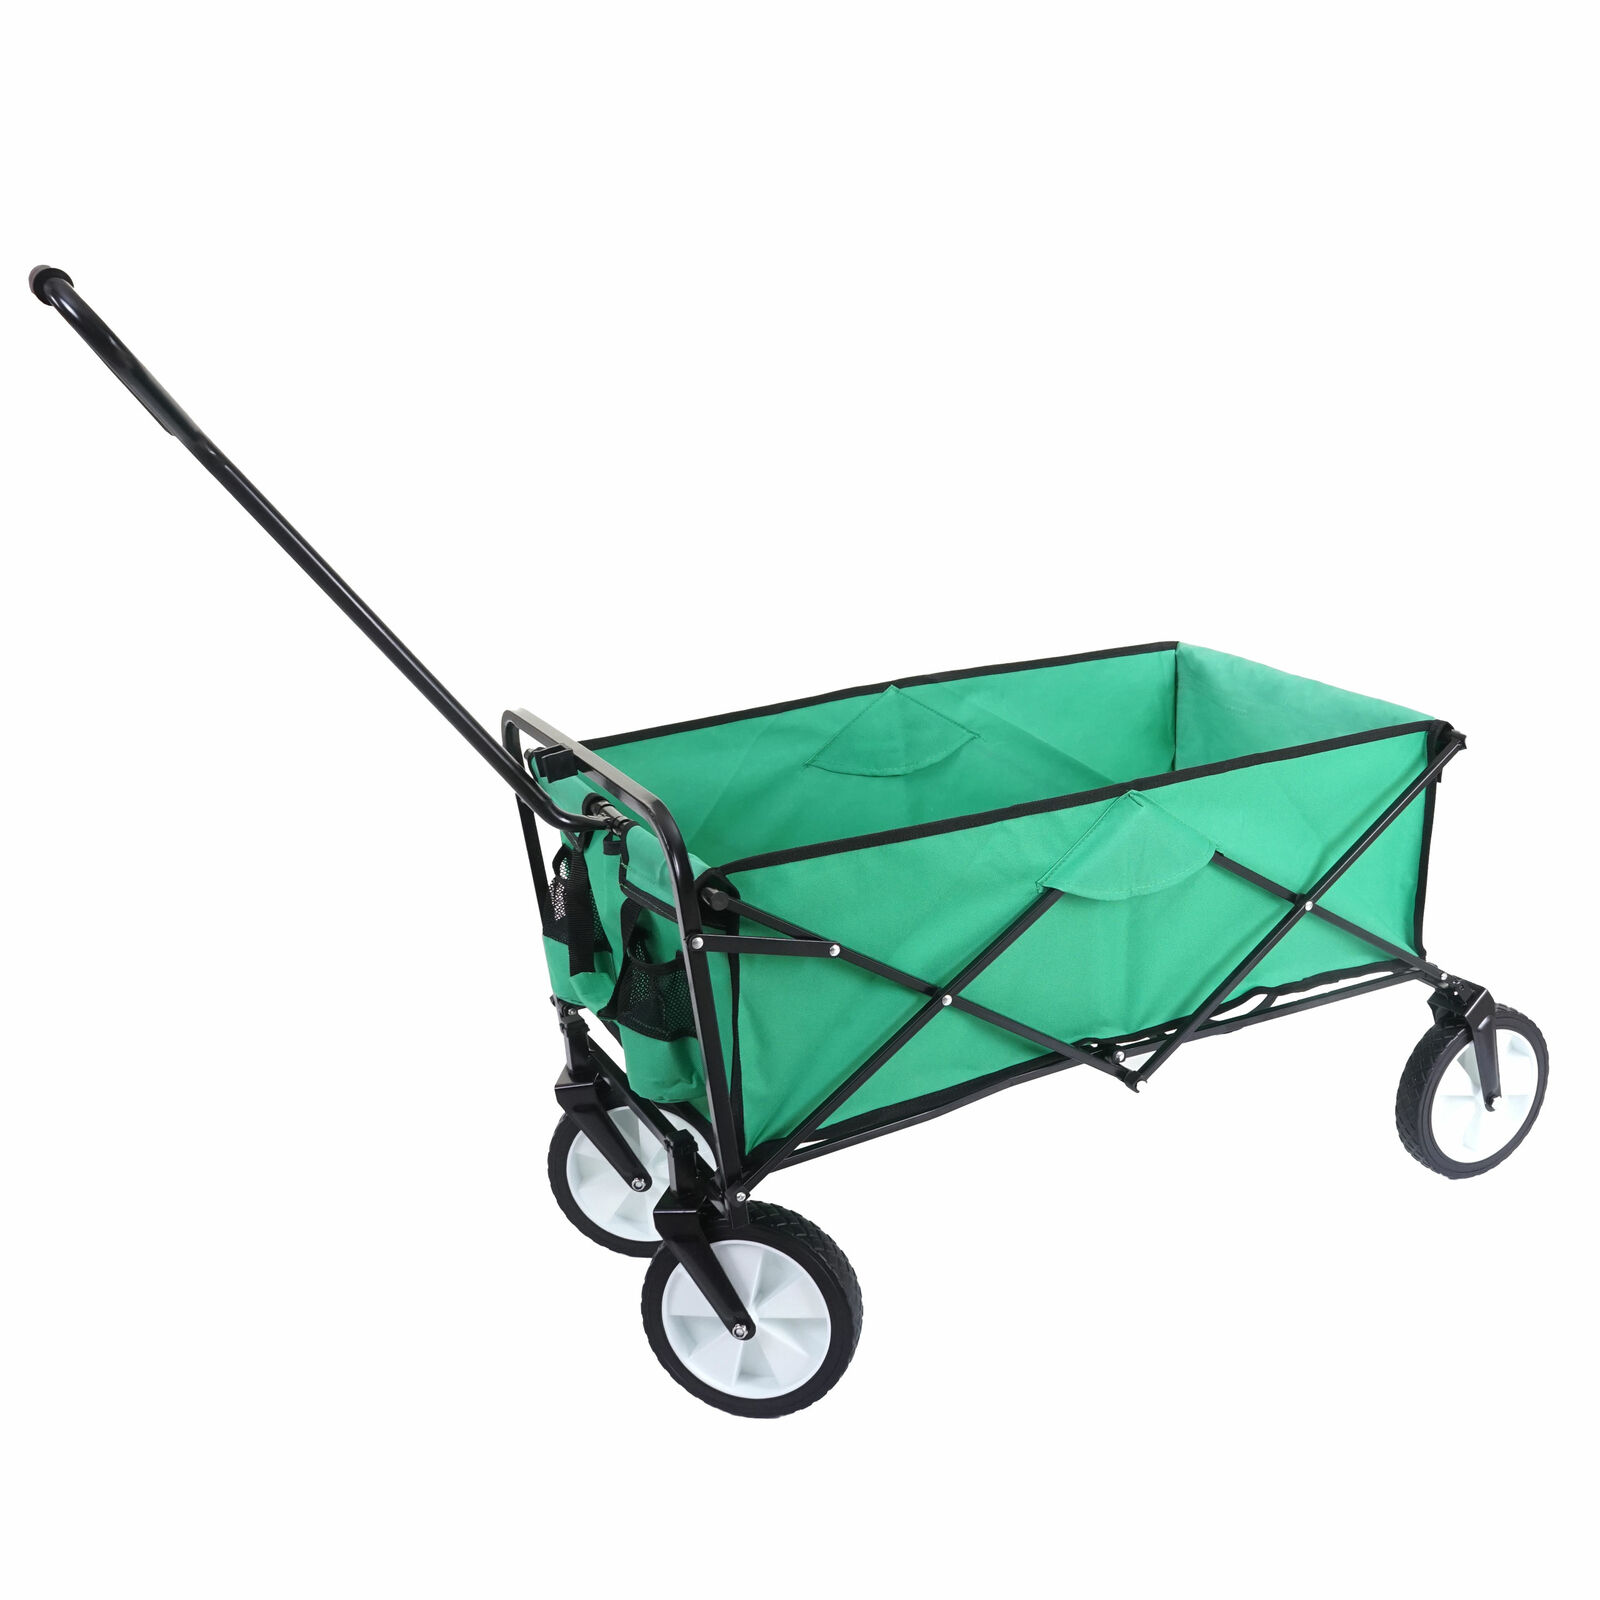 Faltbarer Bollerwagen HWC-E38 Handwagen klappbar ohne Dach Hecktasche grün grün grün 793392